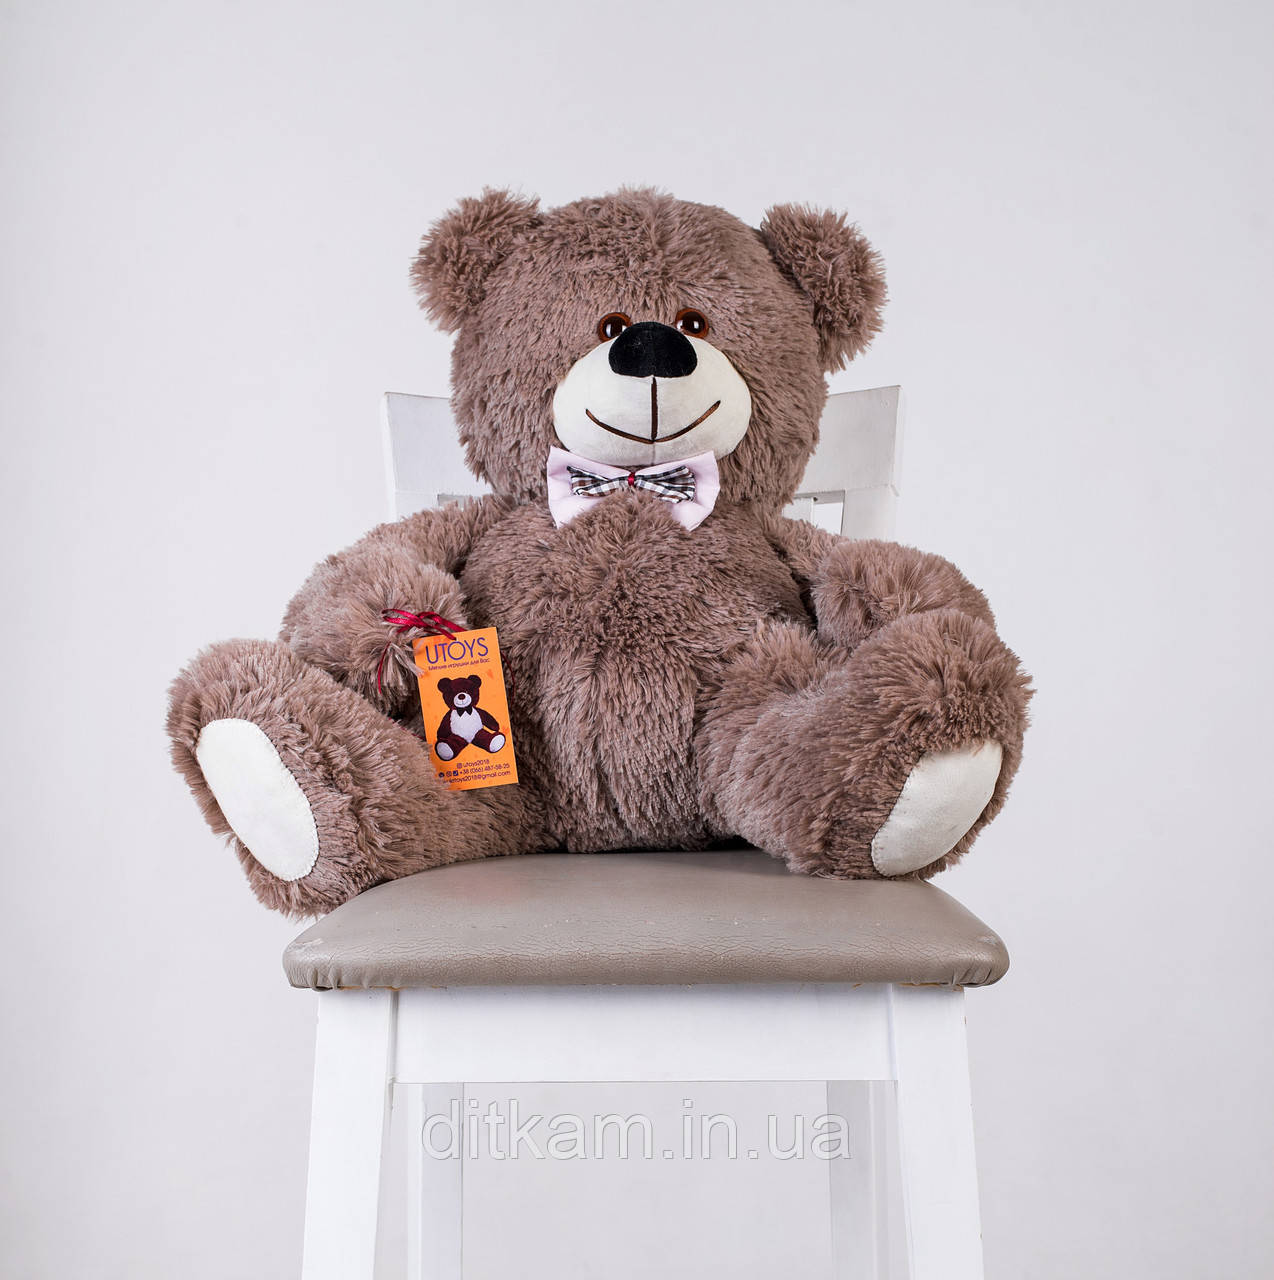 Мягкая игрушка Медведь Джеймс (65см)Капучино